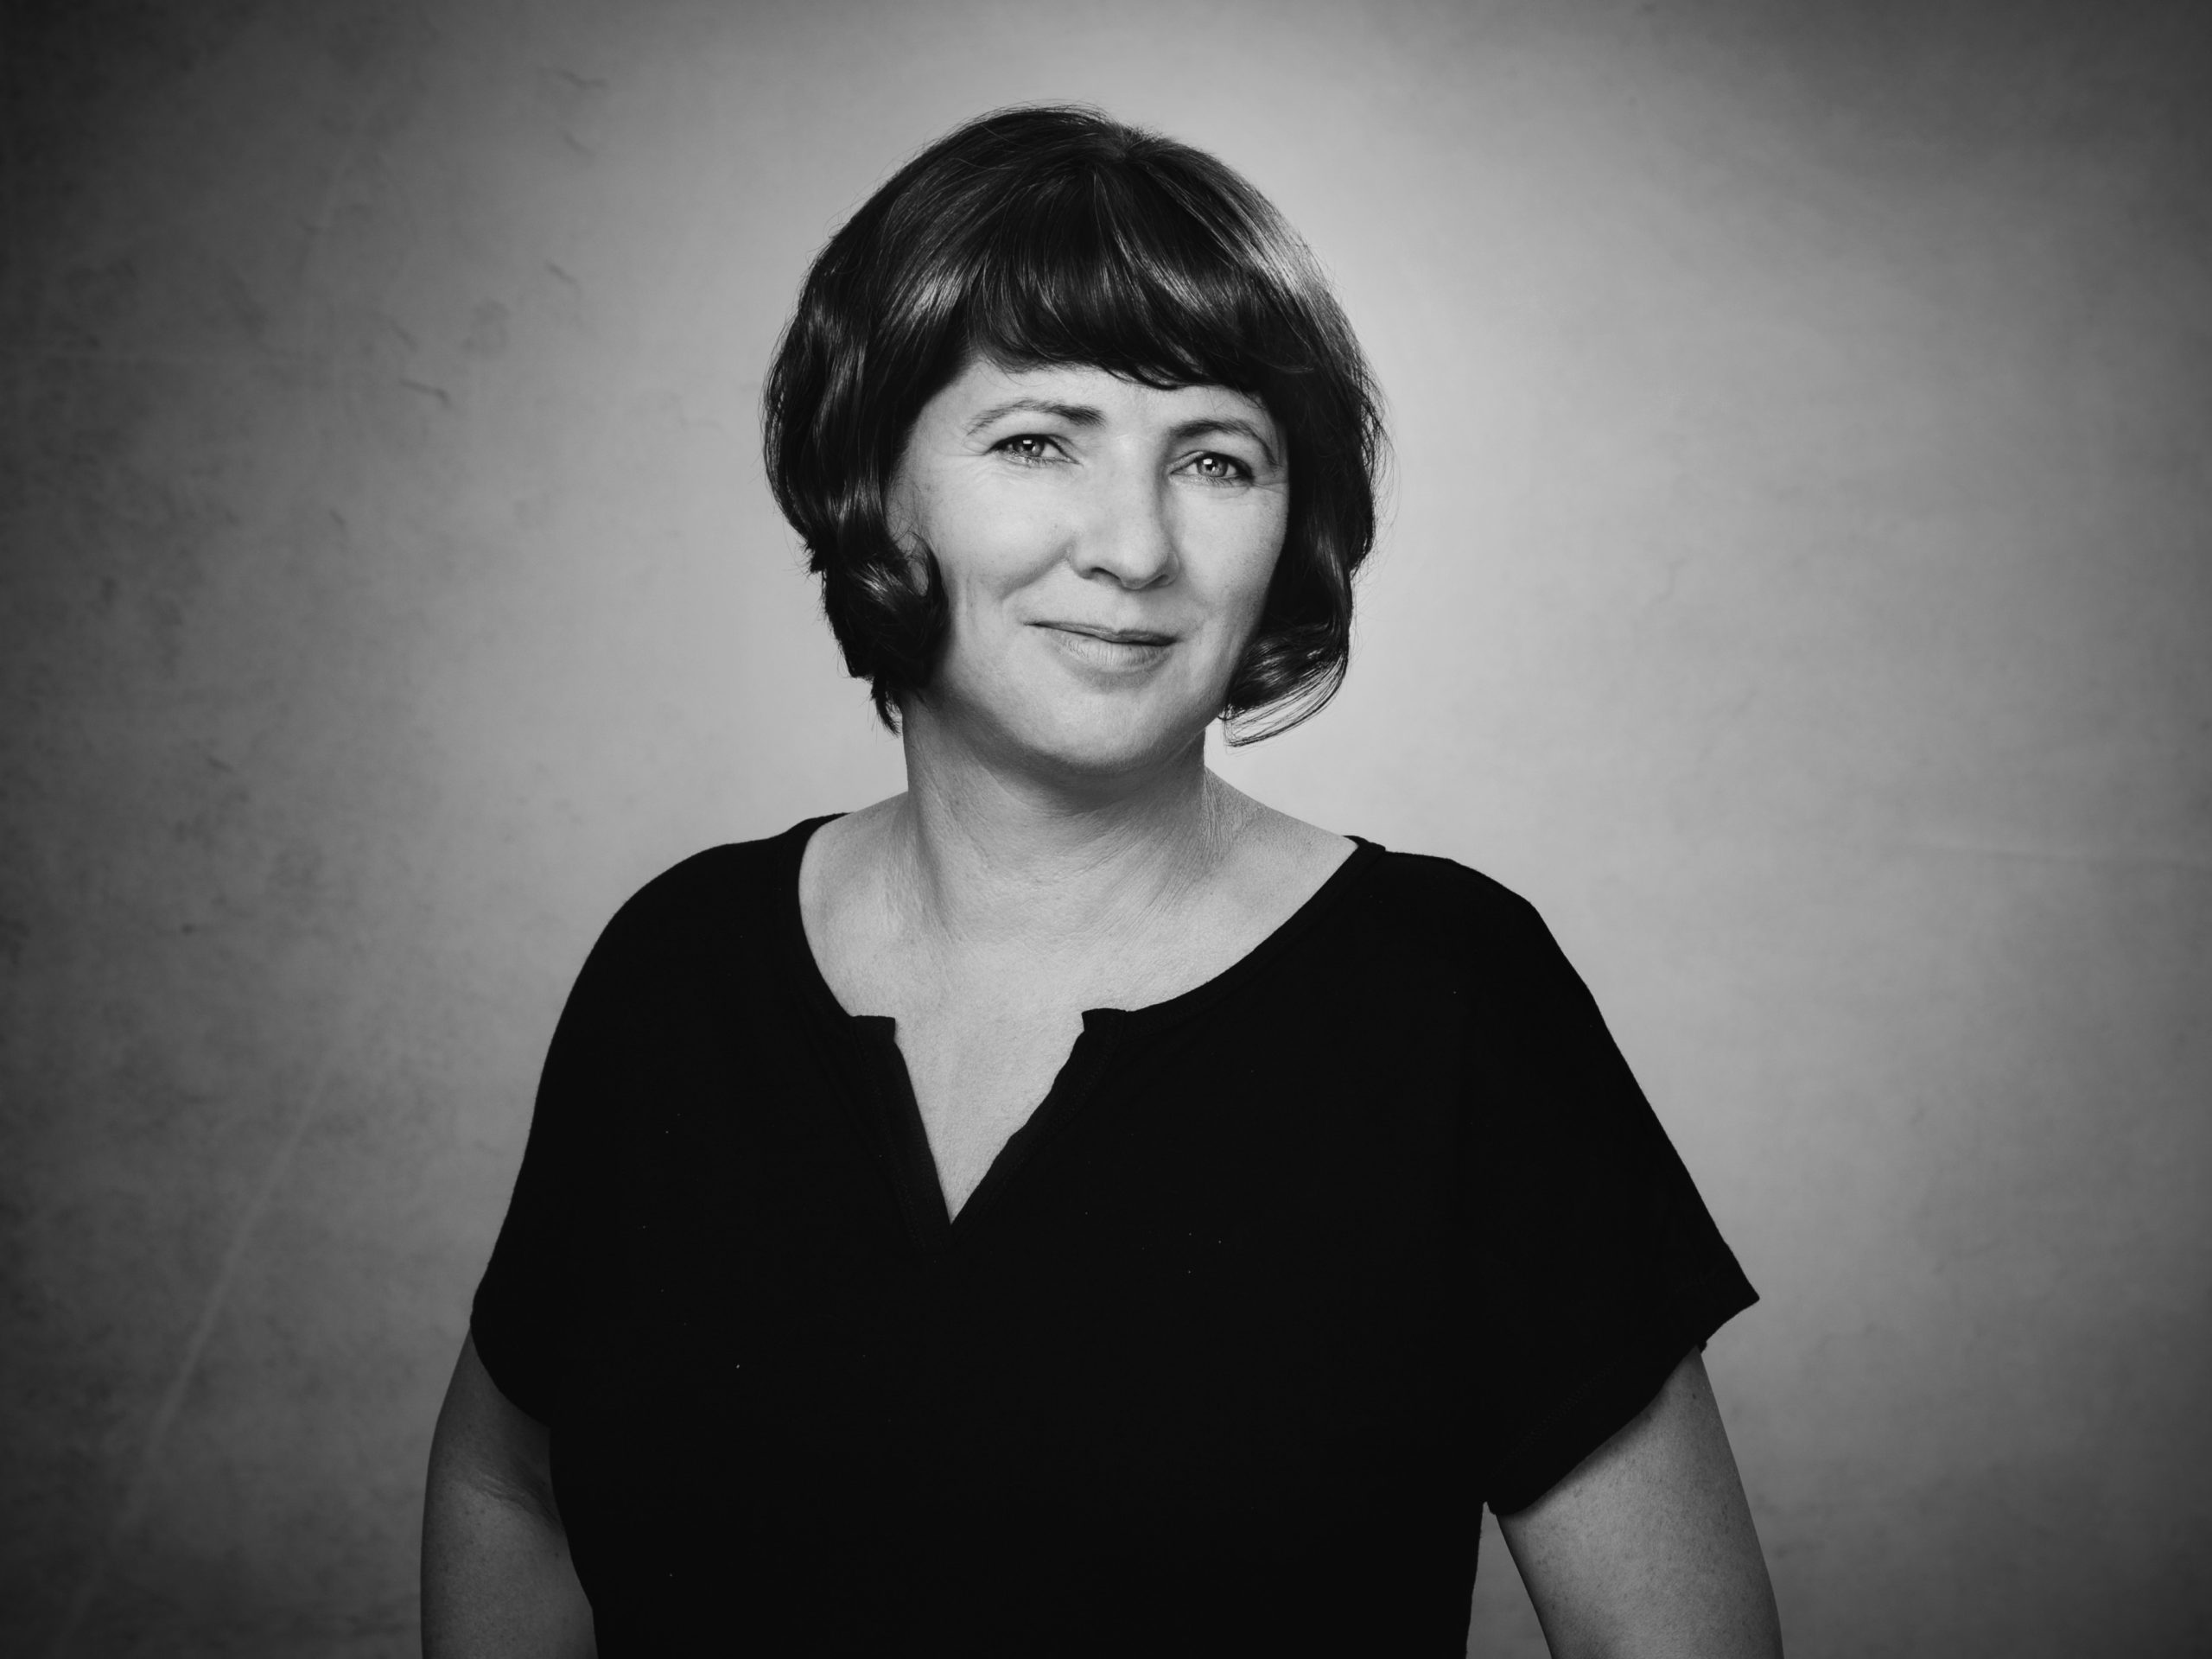 Katrin Grafe